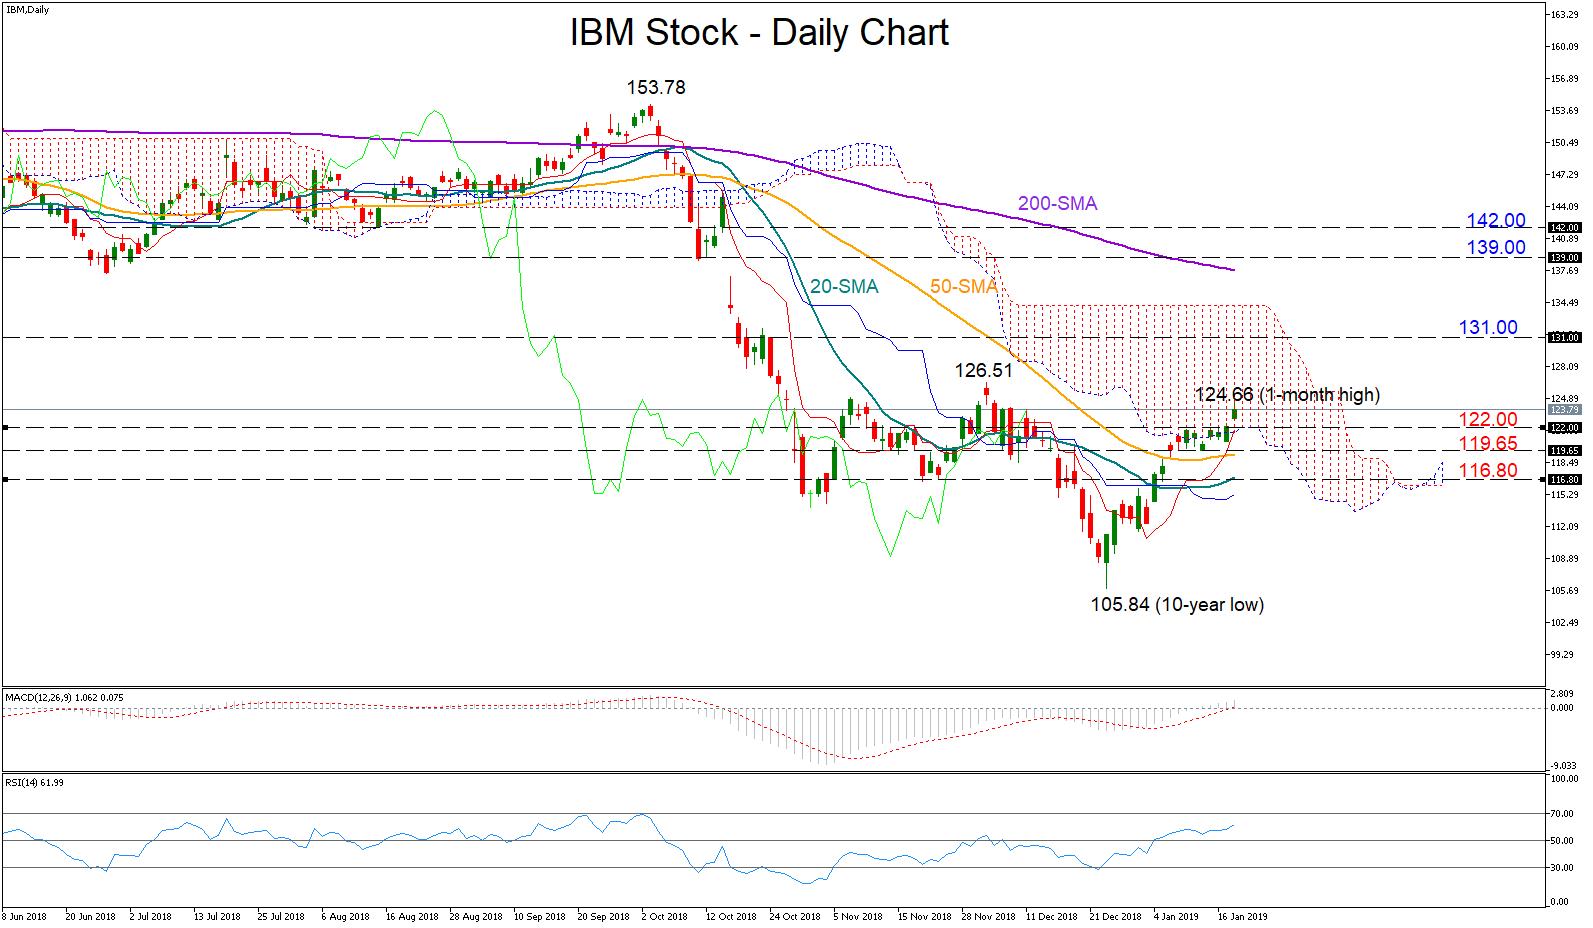 Technical Analysis – IBM stock looks positive ahead of Q4